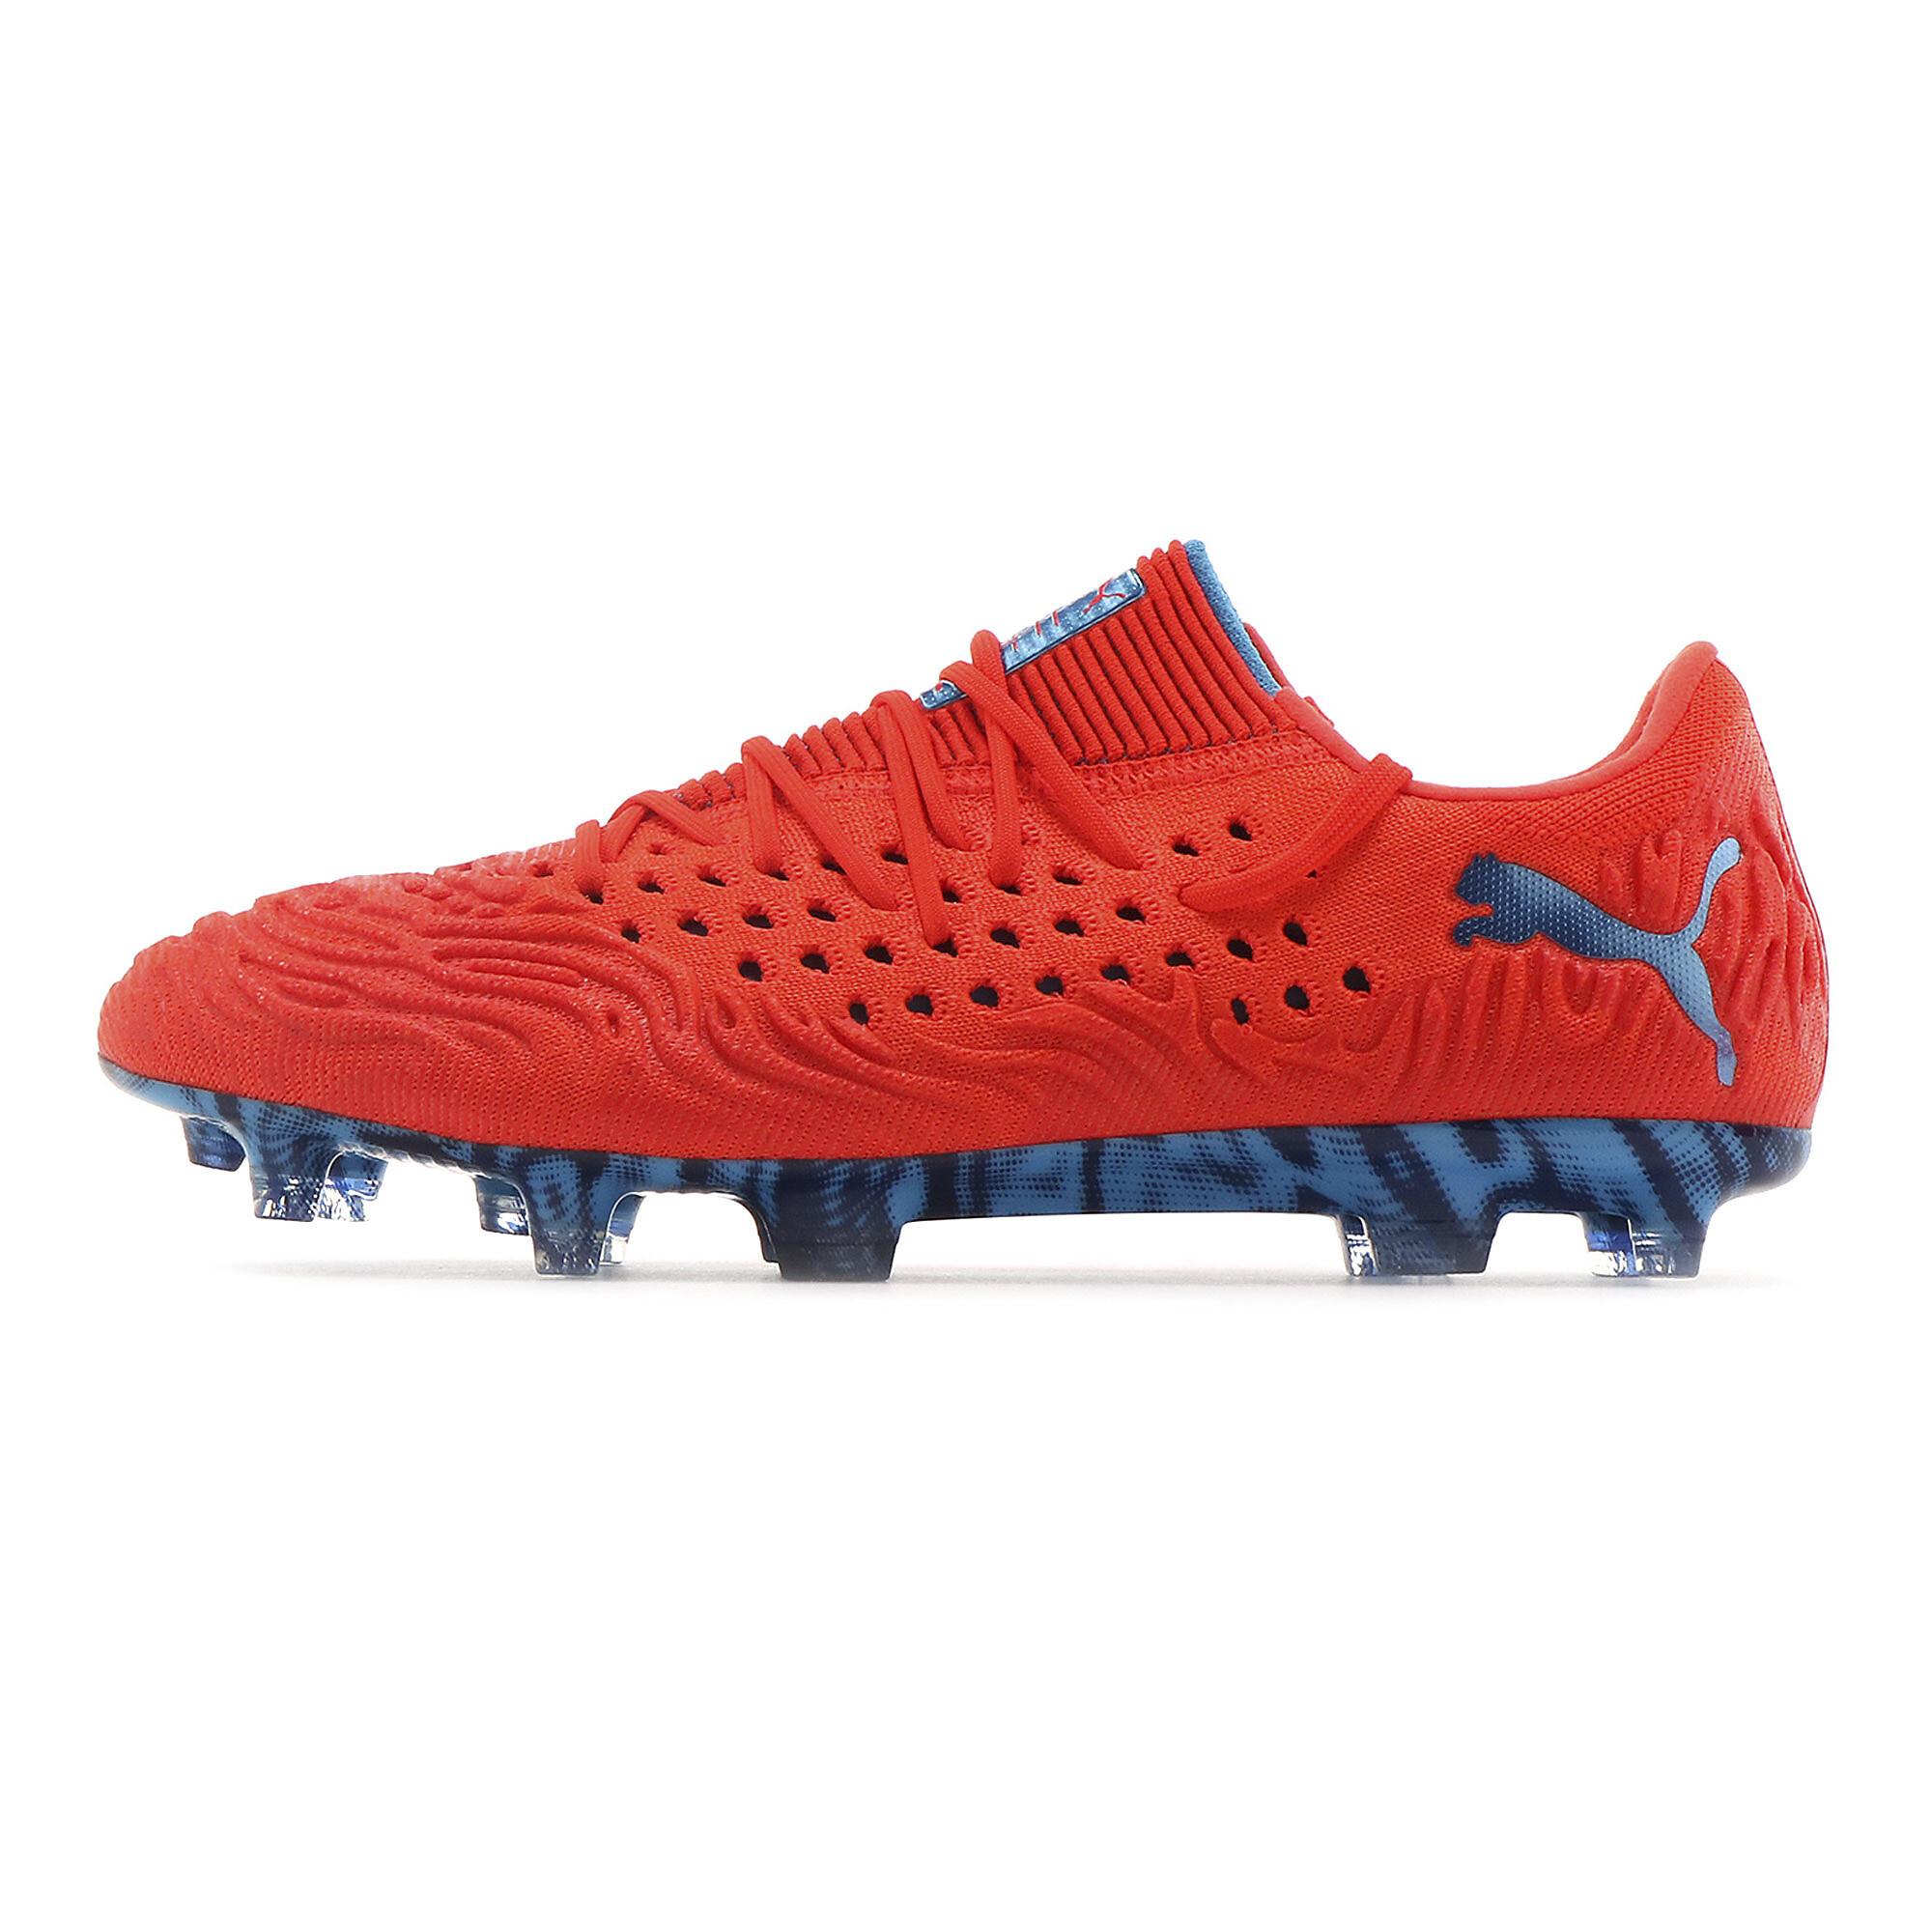 46b3b7bf Спортивная обувь для футбола: мужские бутсы, футзалки и сороконожки PUMA